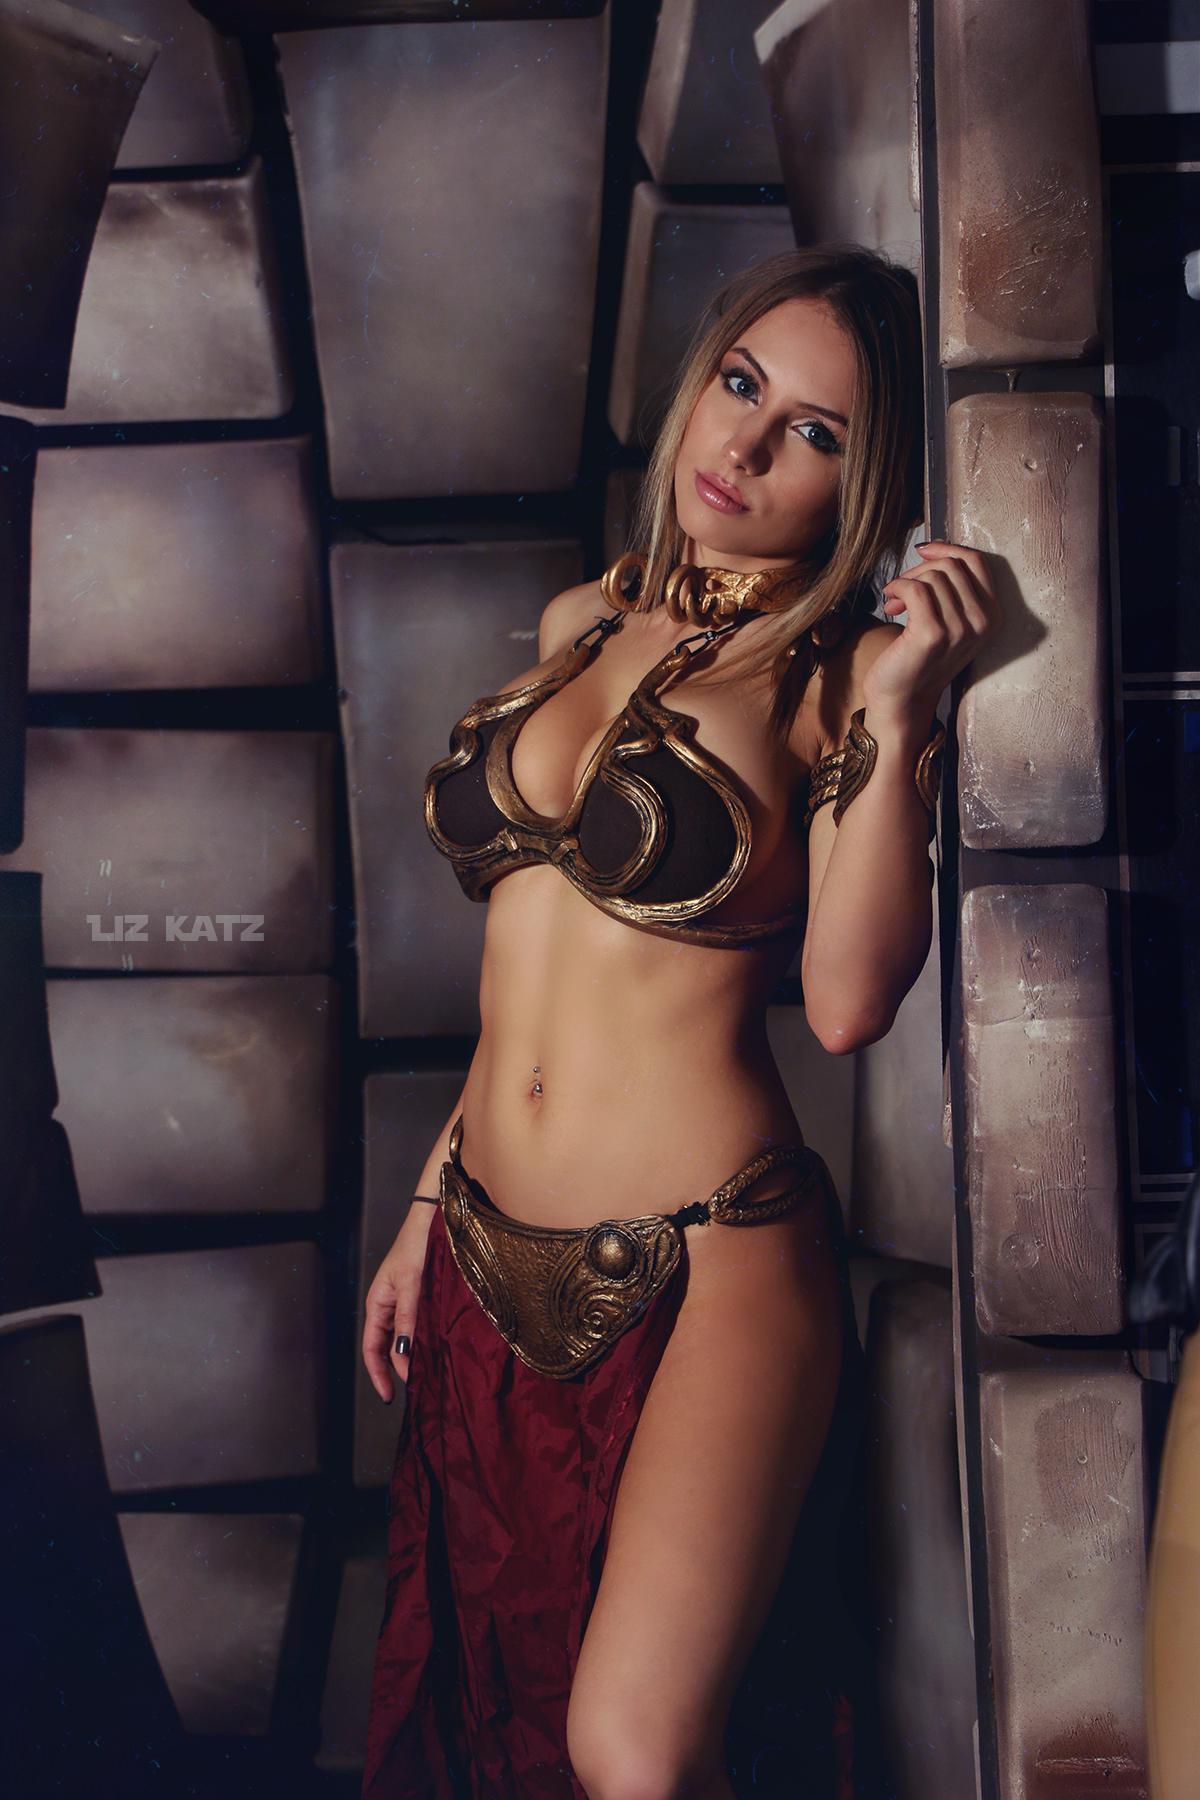 Liz Katz Slave Leia Nude Cosplay Onlyfans Leaked Photos 19